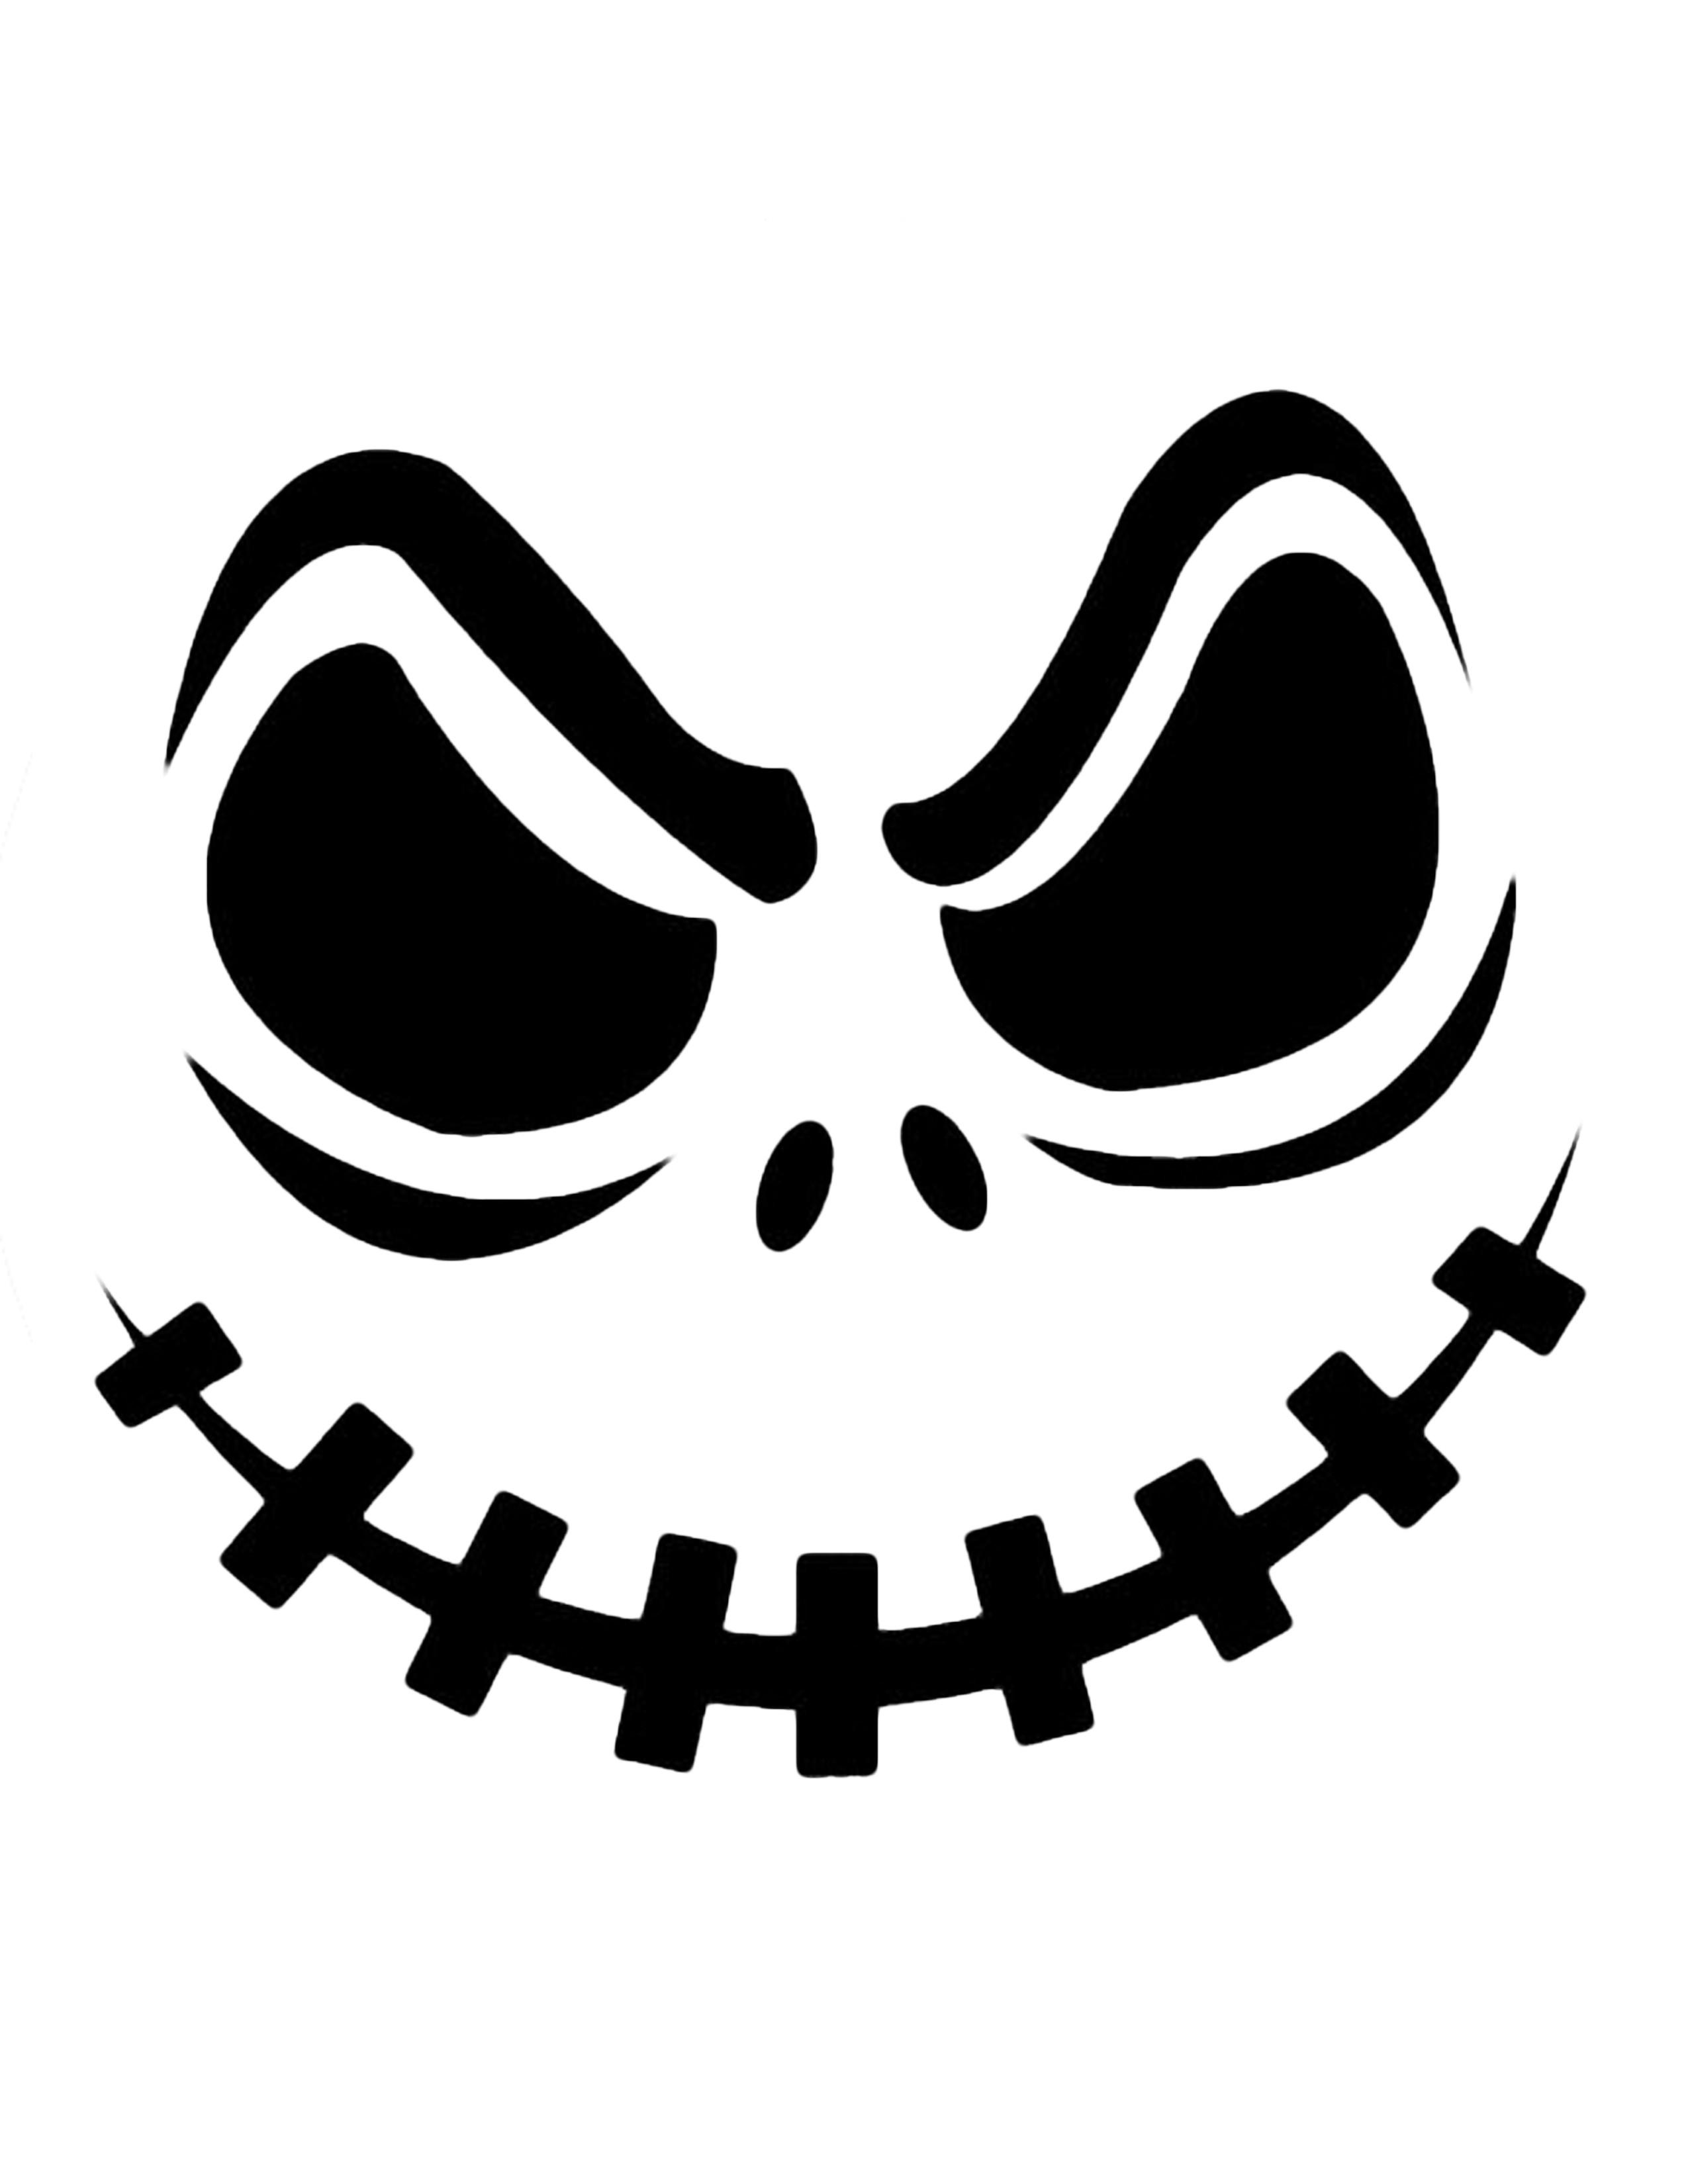 Scary Halloween Clipart Black .-Scary Halloween Clipart Black .-6